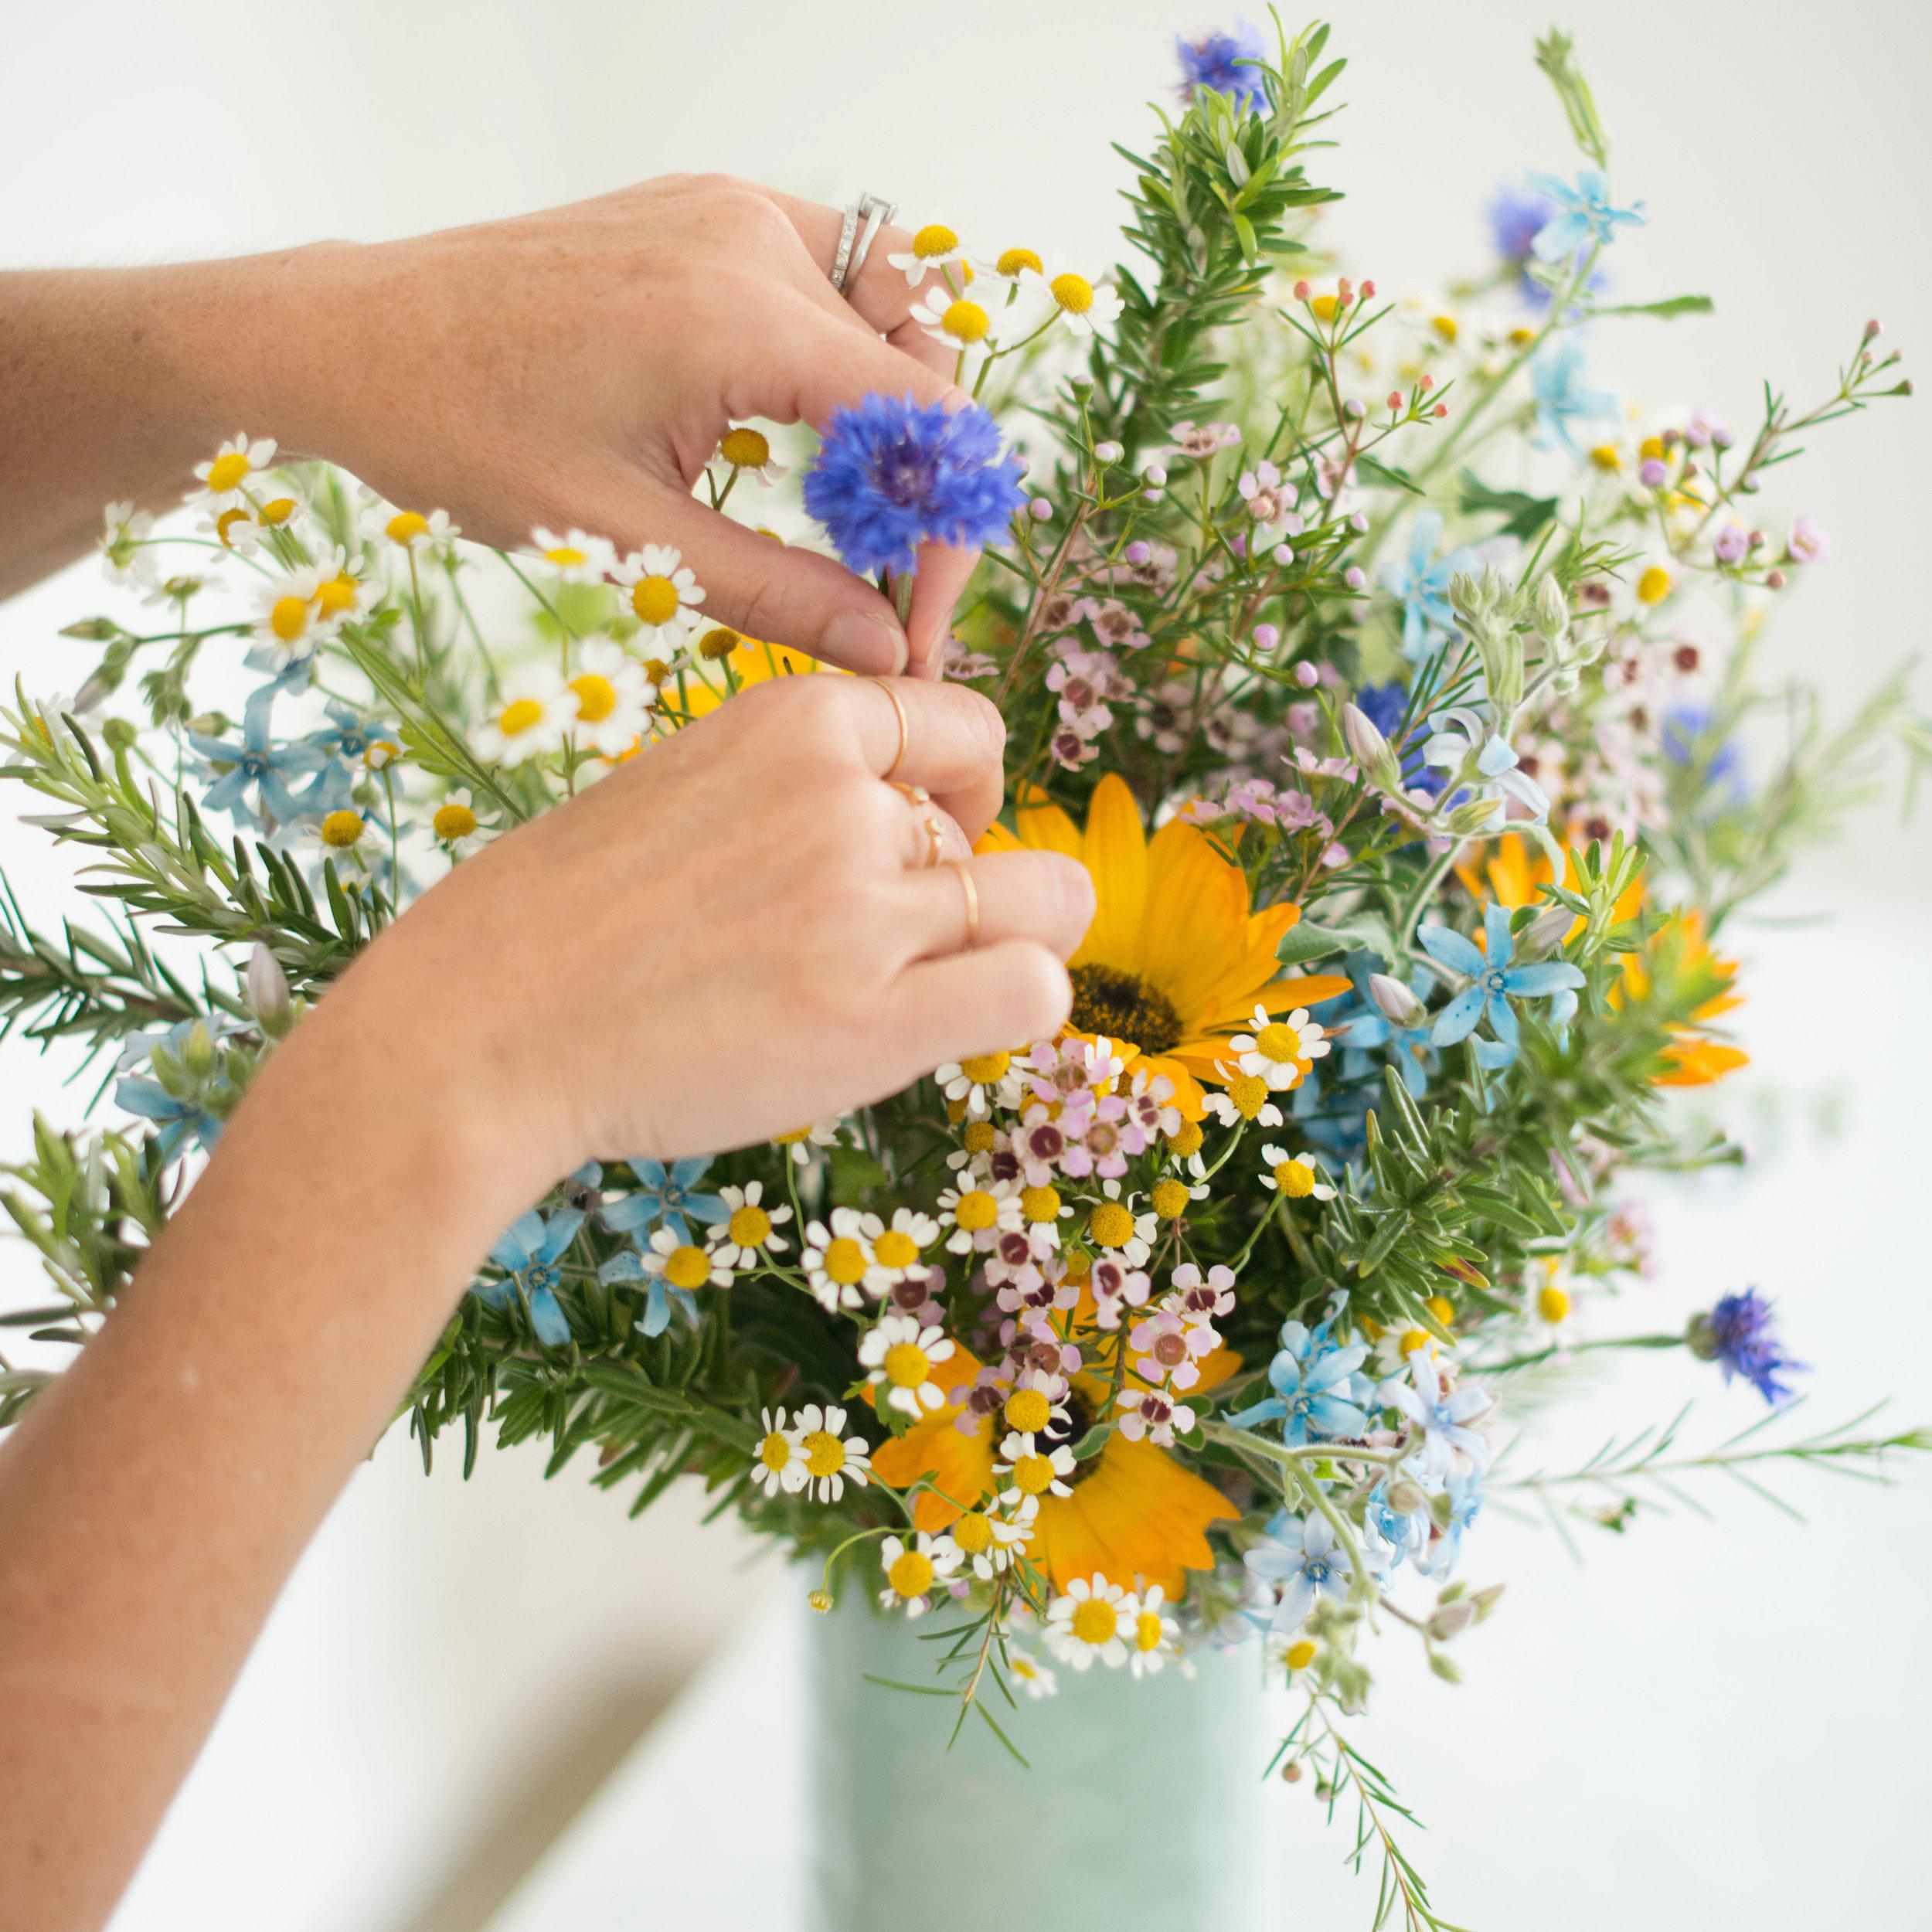 Still Haven't Done Your Shopping? Gift a Subscription | Image via Matilda's Magnolias | Design Confetti